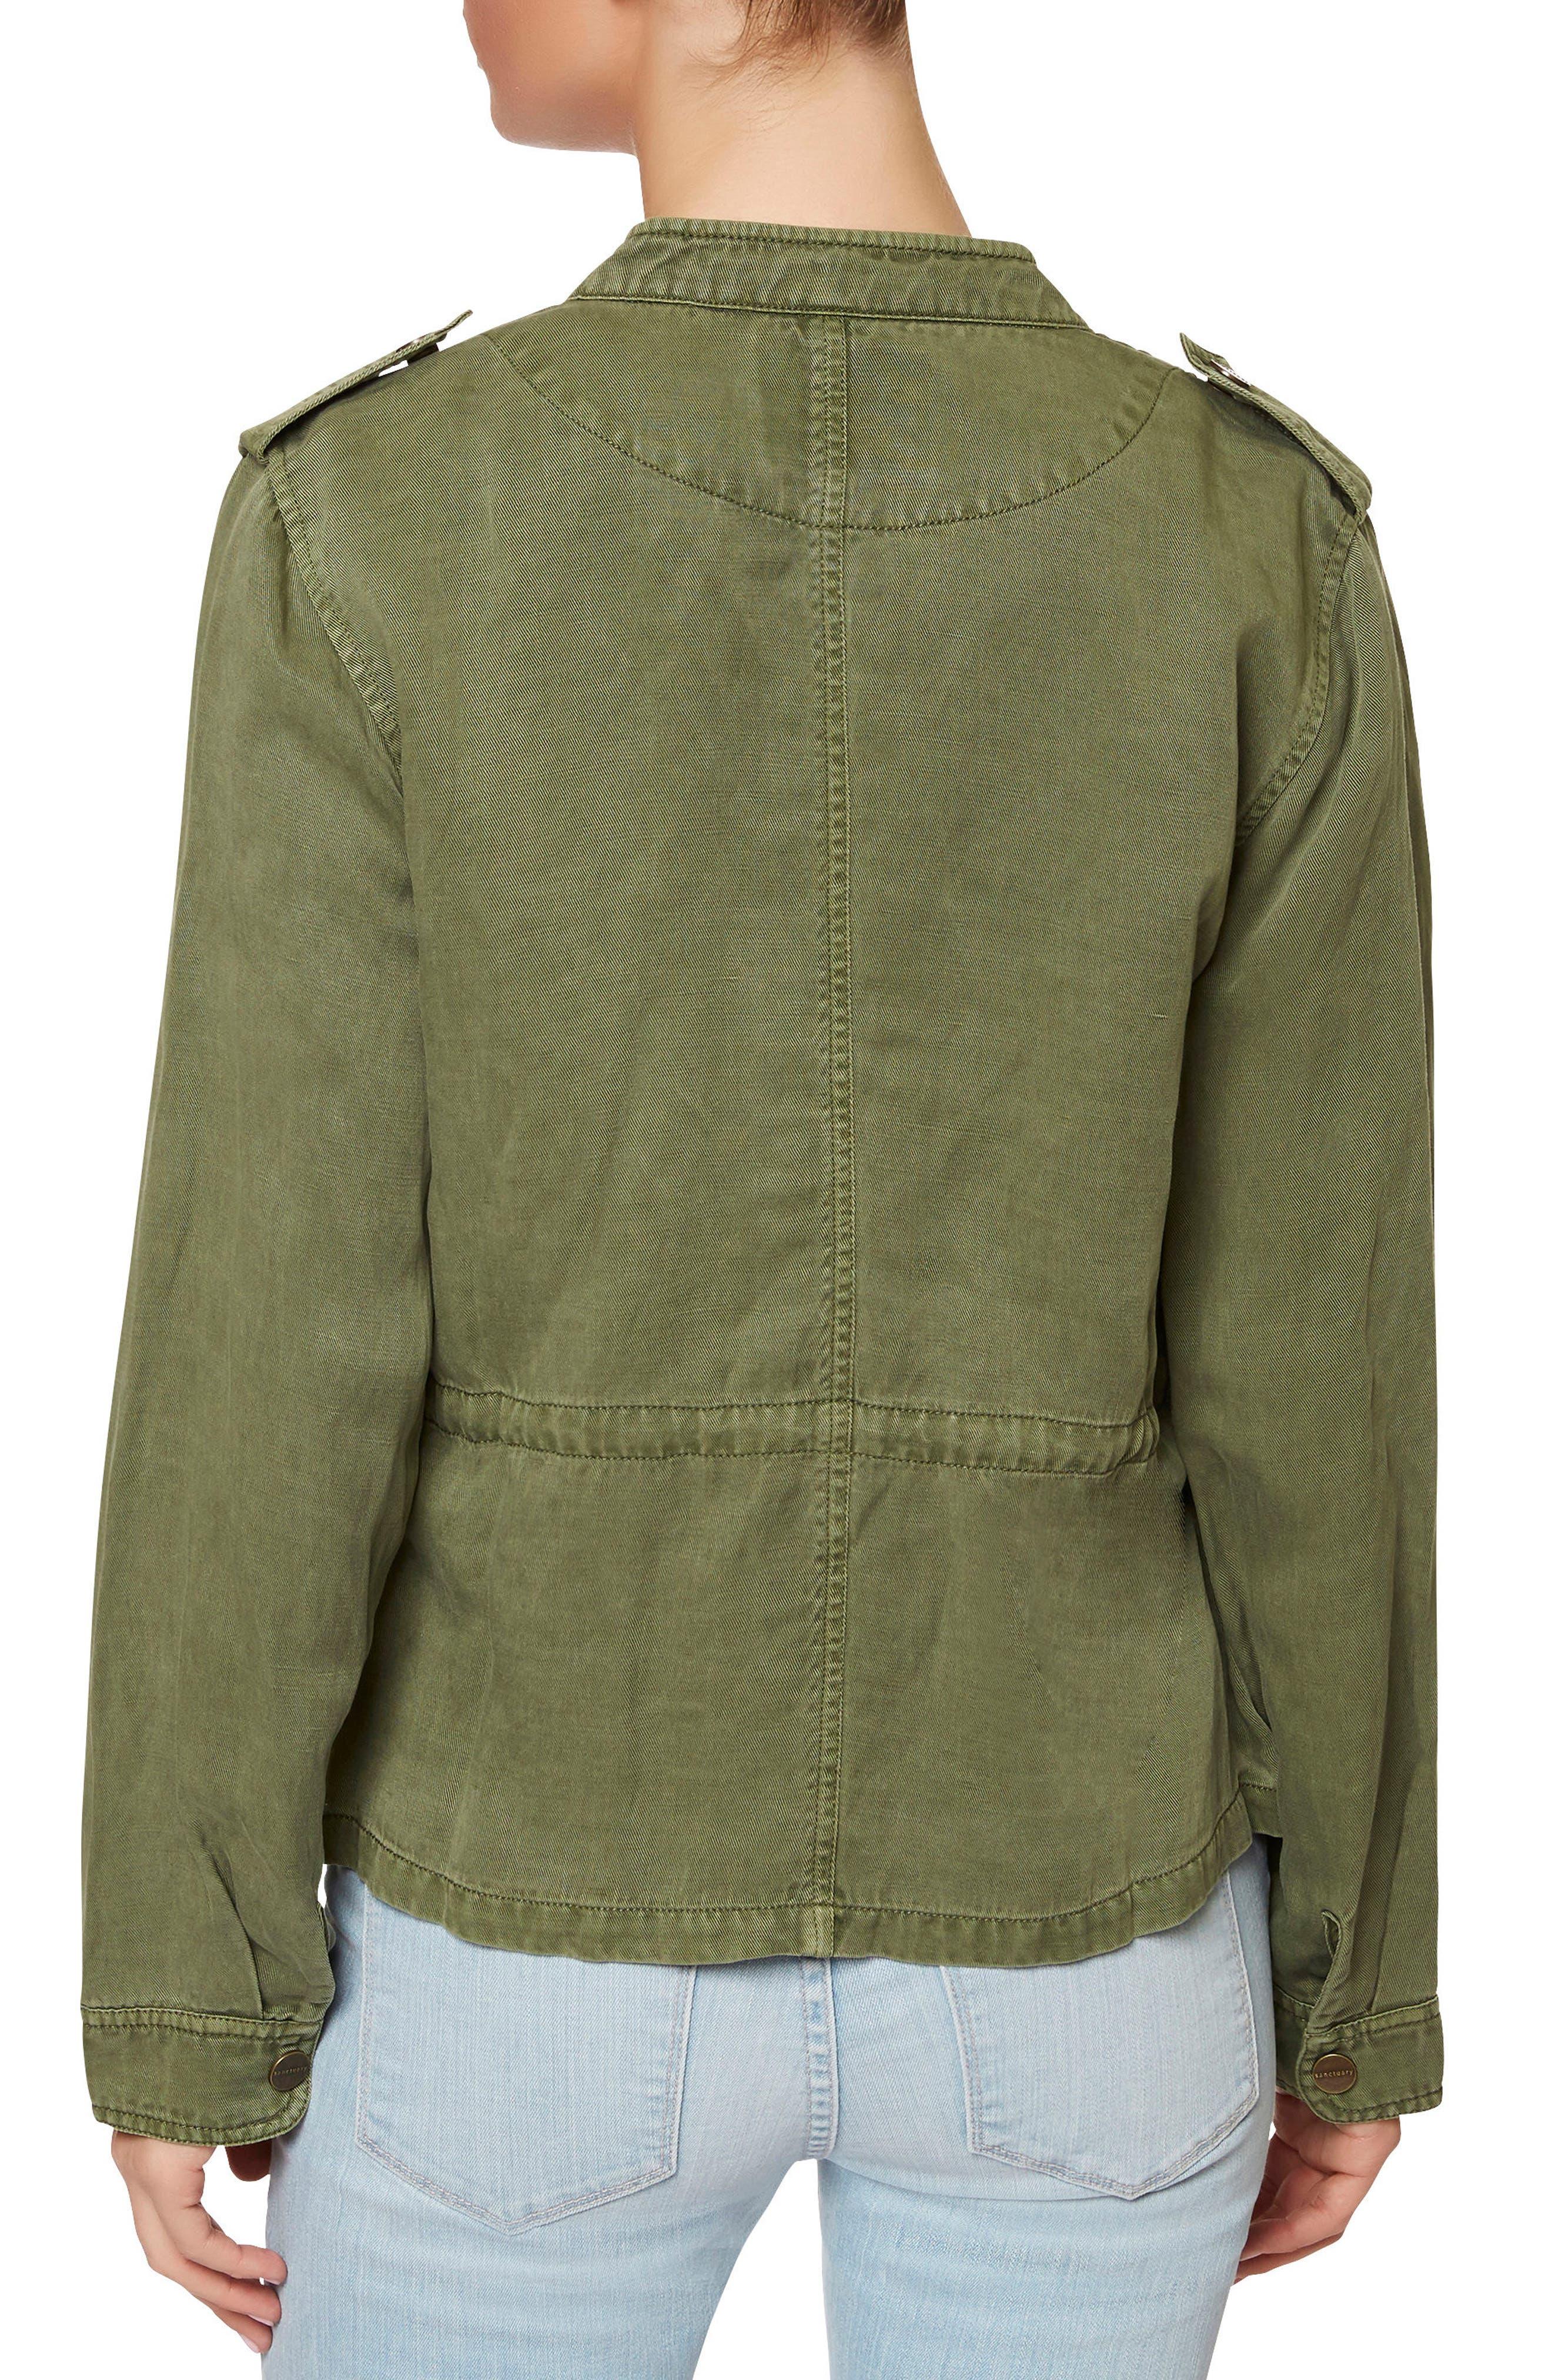 SANCTUARY, Marni Twill Utility Jacket, Alternate thumbnail 2, color, 300